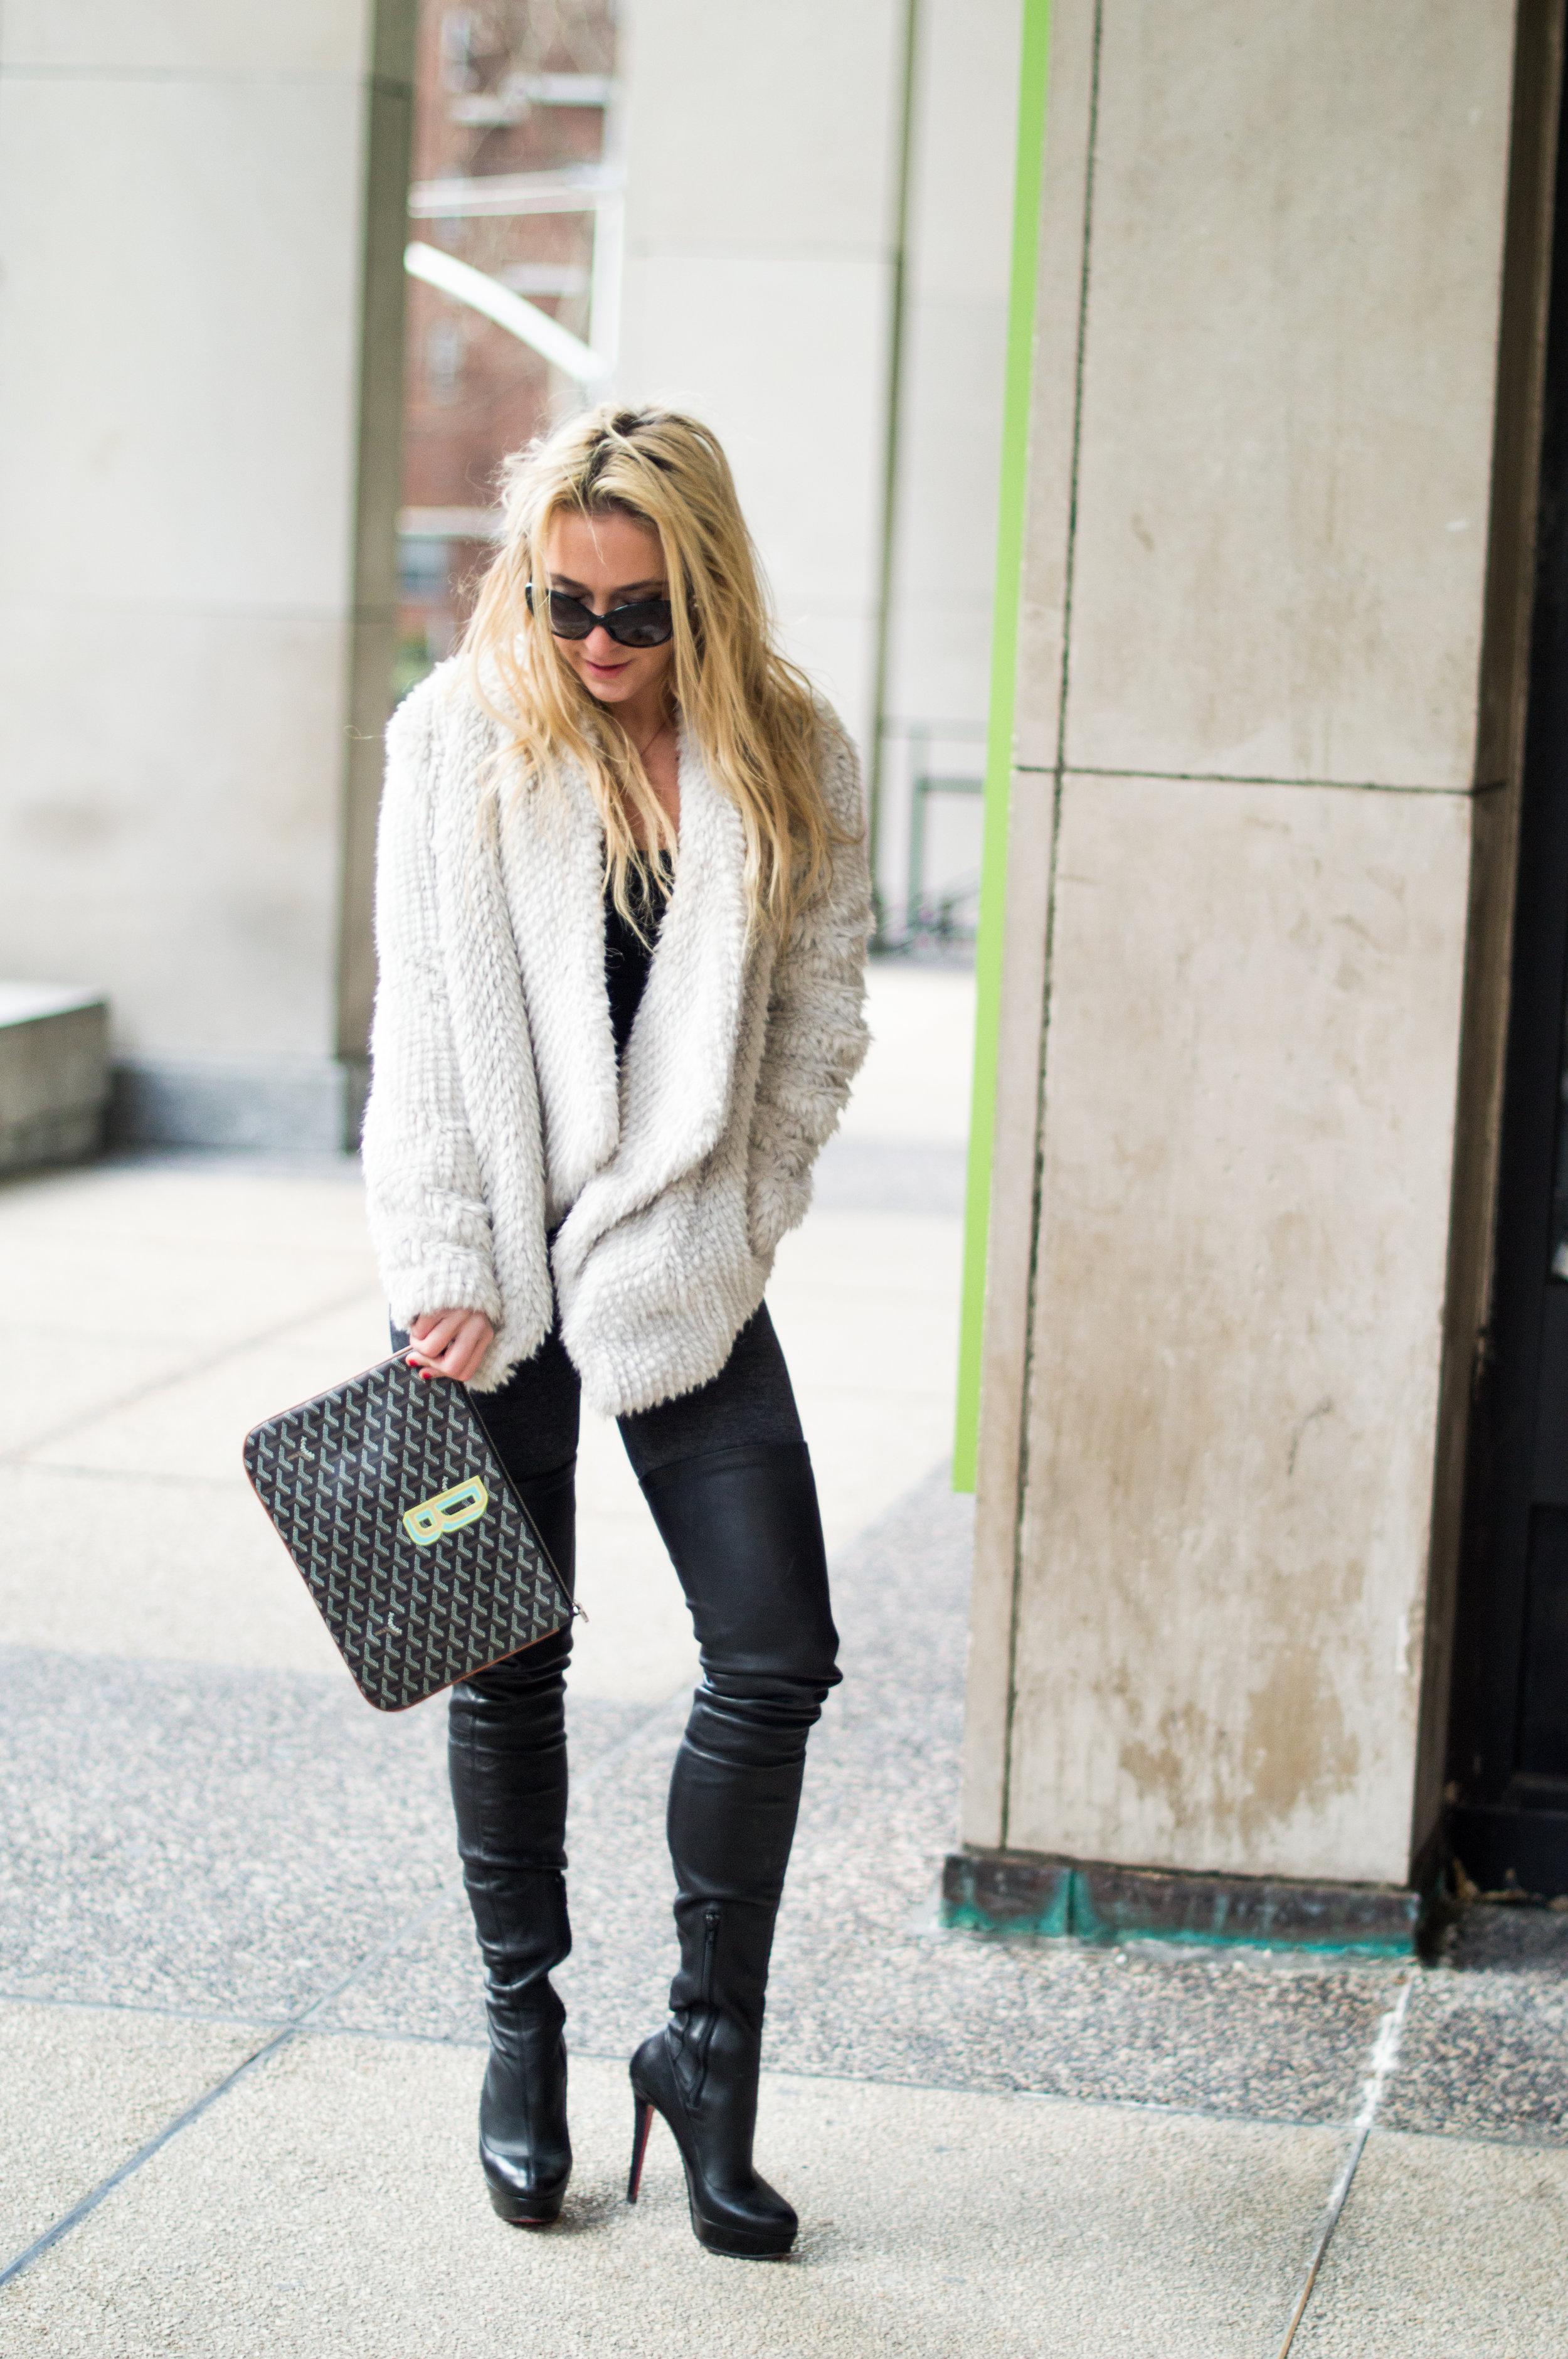 Leggings: Lanston Sport, Top: Brandy Melville, Jacket: Bardot, Boots: Christian Louboutin, Sunglasses: Prada